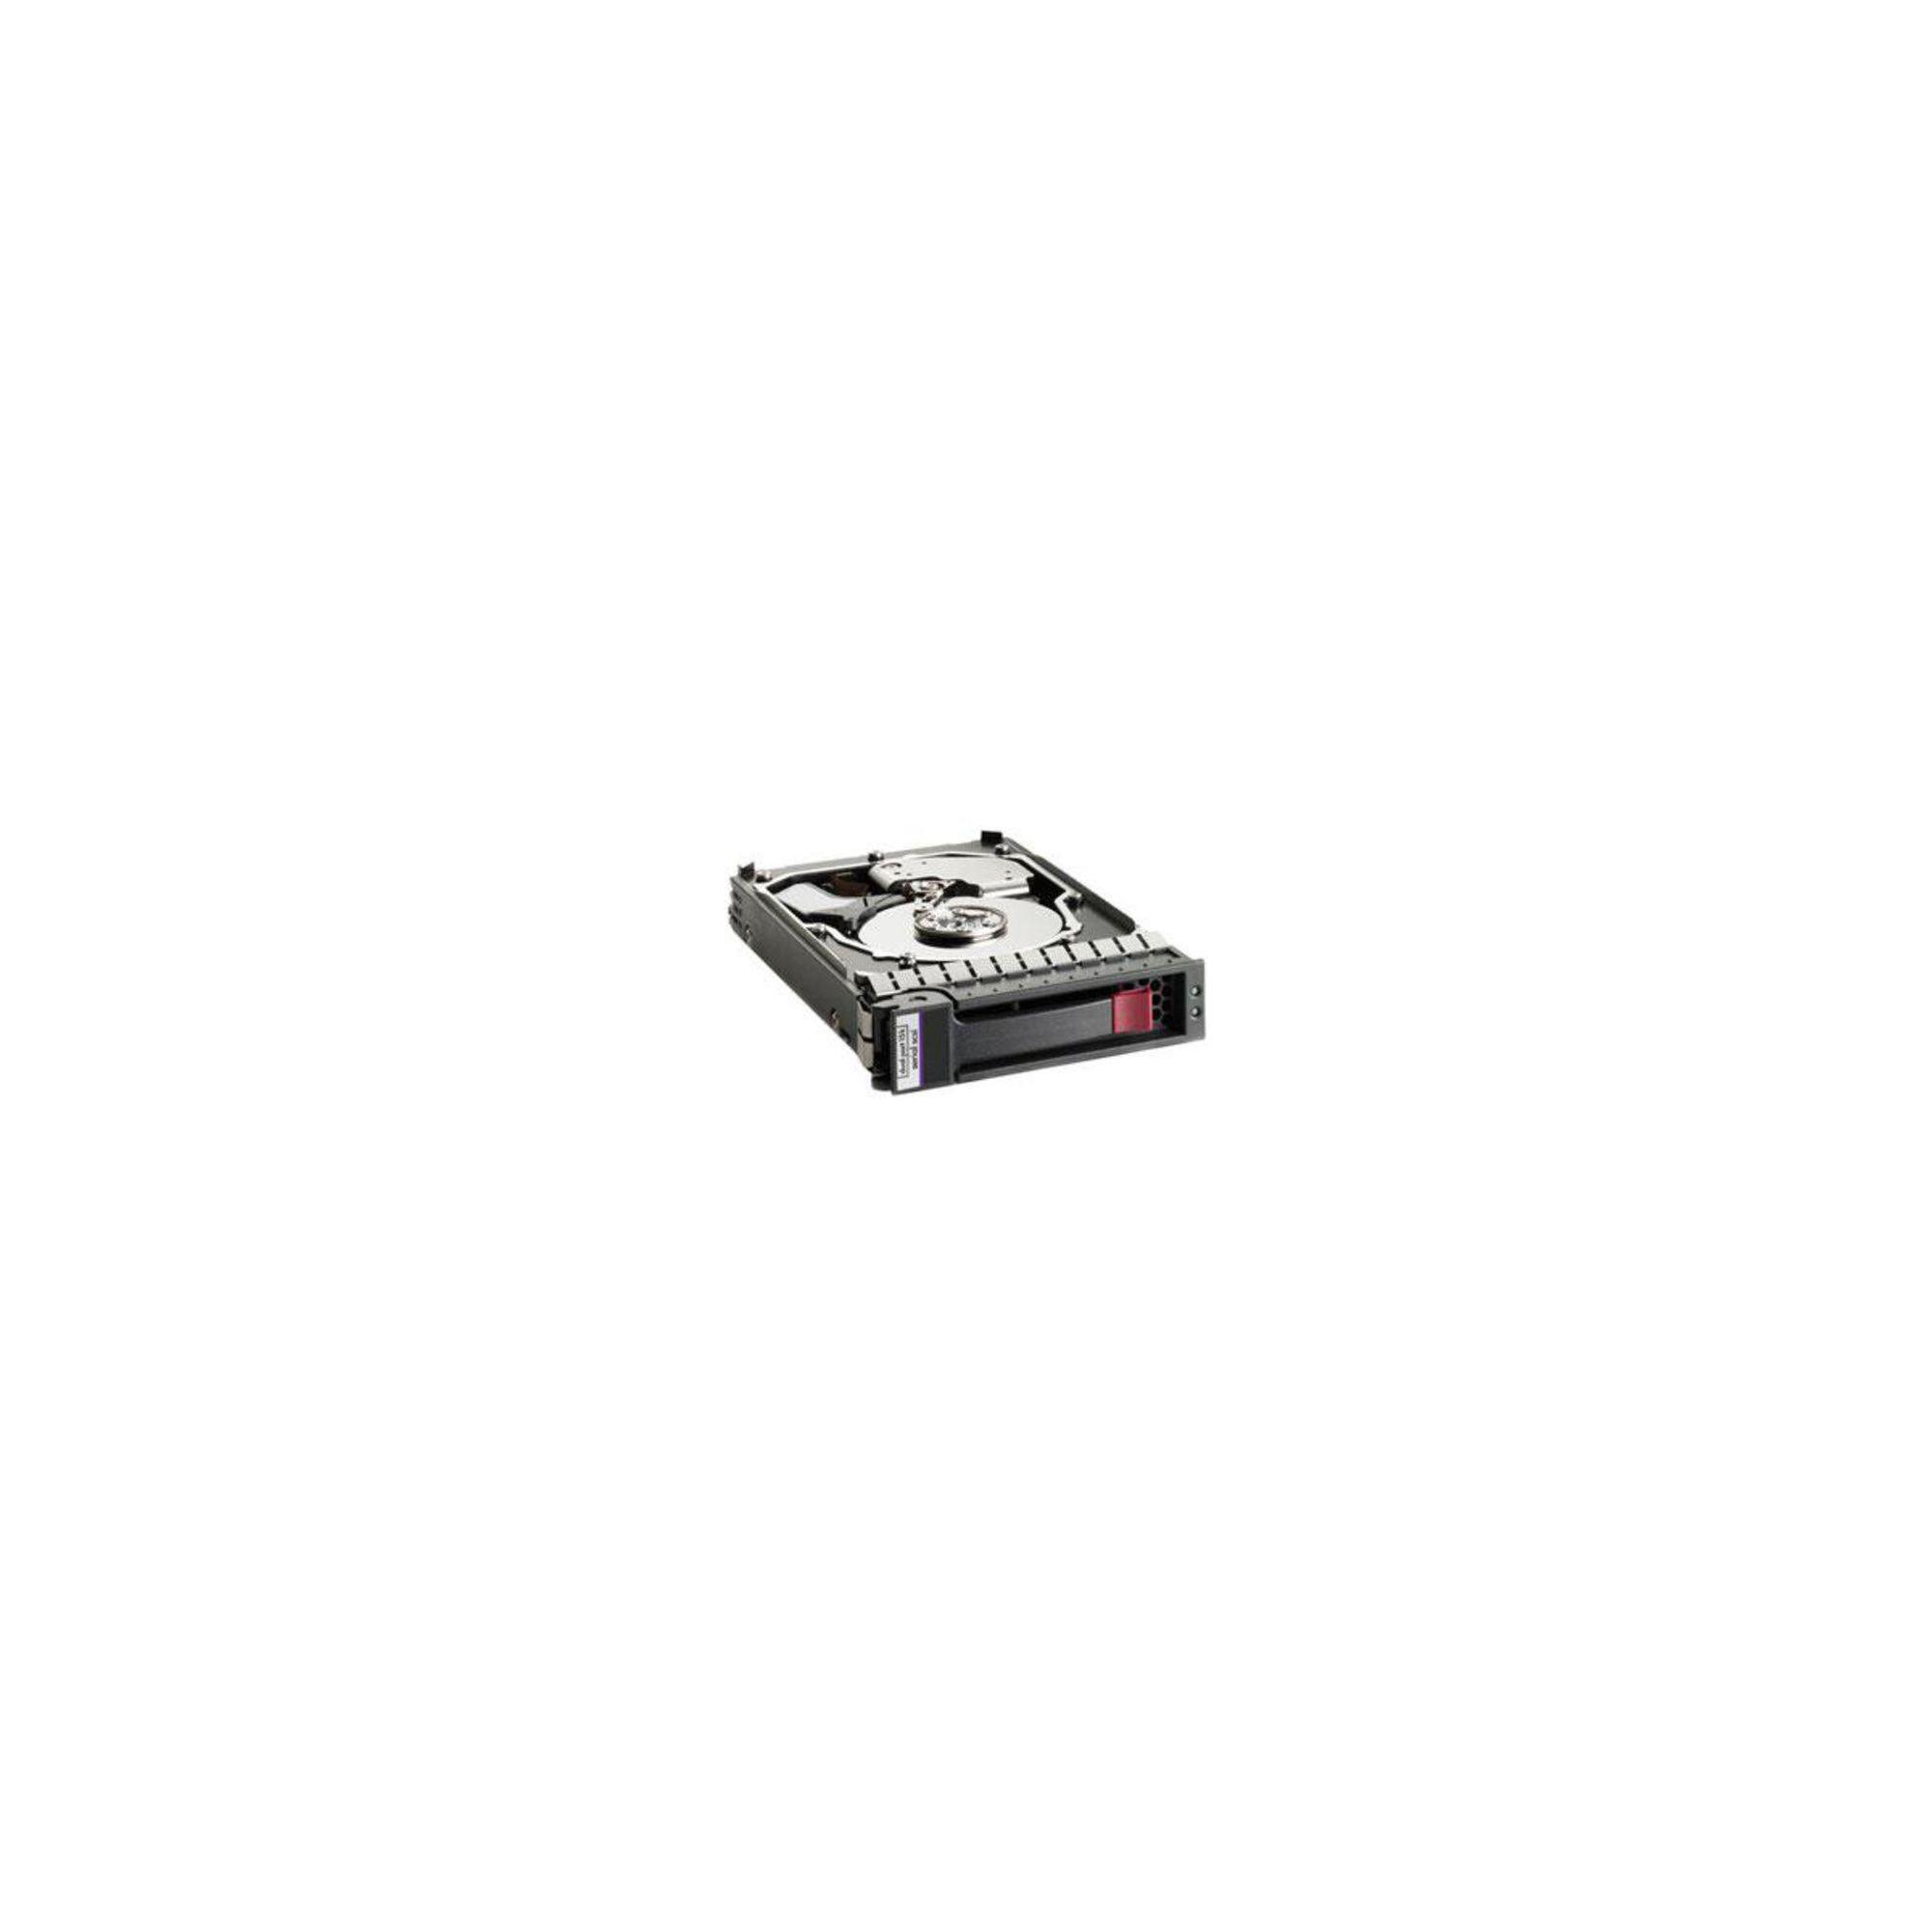 Hewlett-Packard P2000 300GB 6G SAS 15K rpm LFF Dual Port Enterprise Hard Drive at Tesco Direct